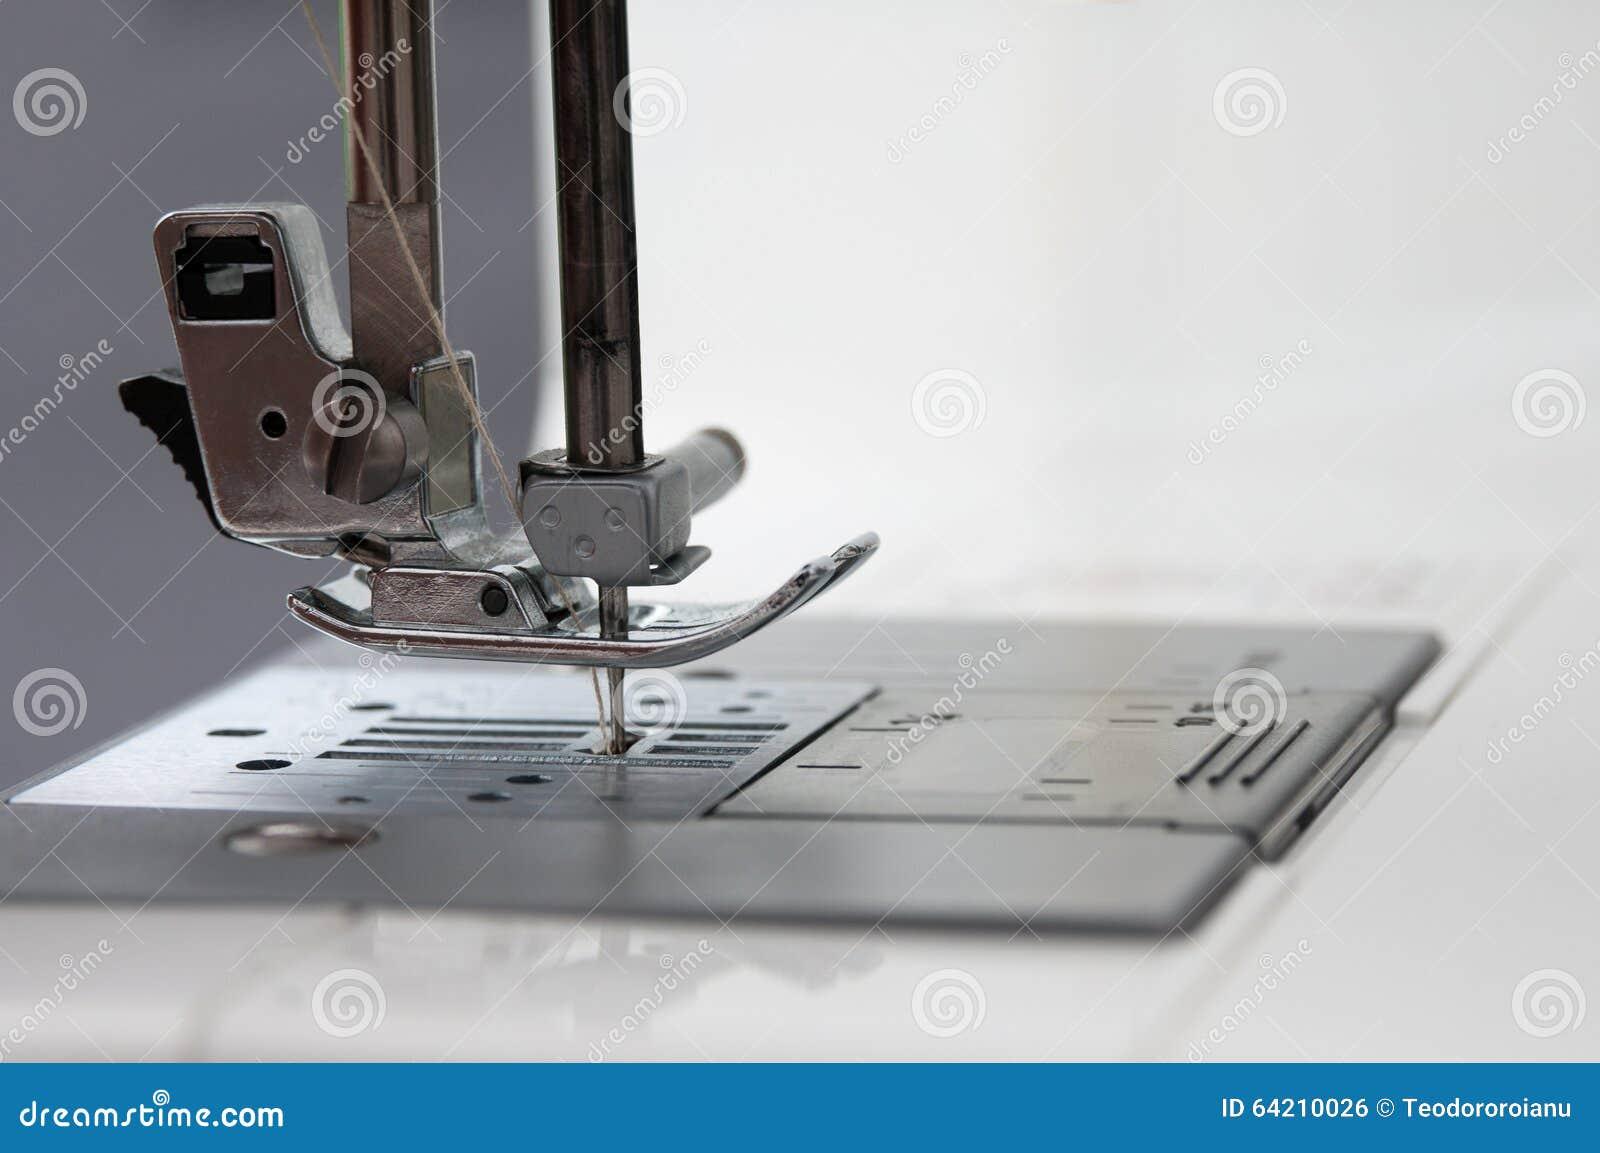 Mecanismo de aguja